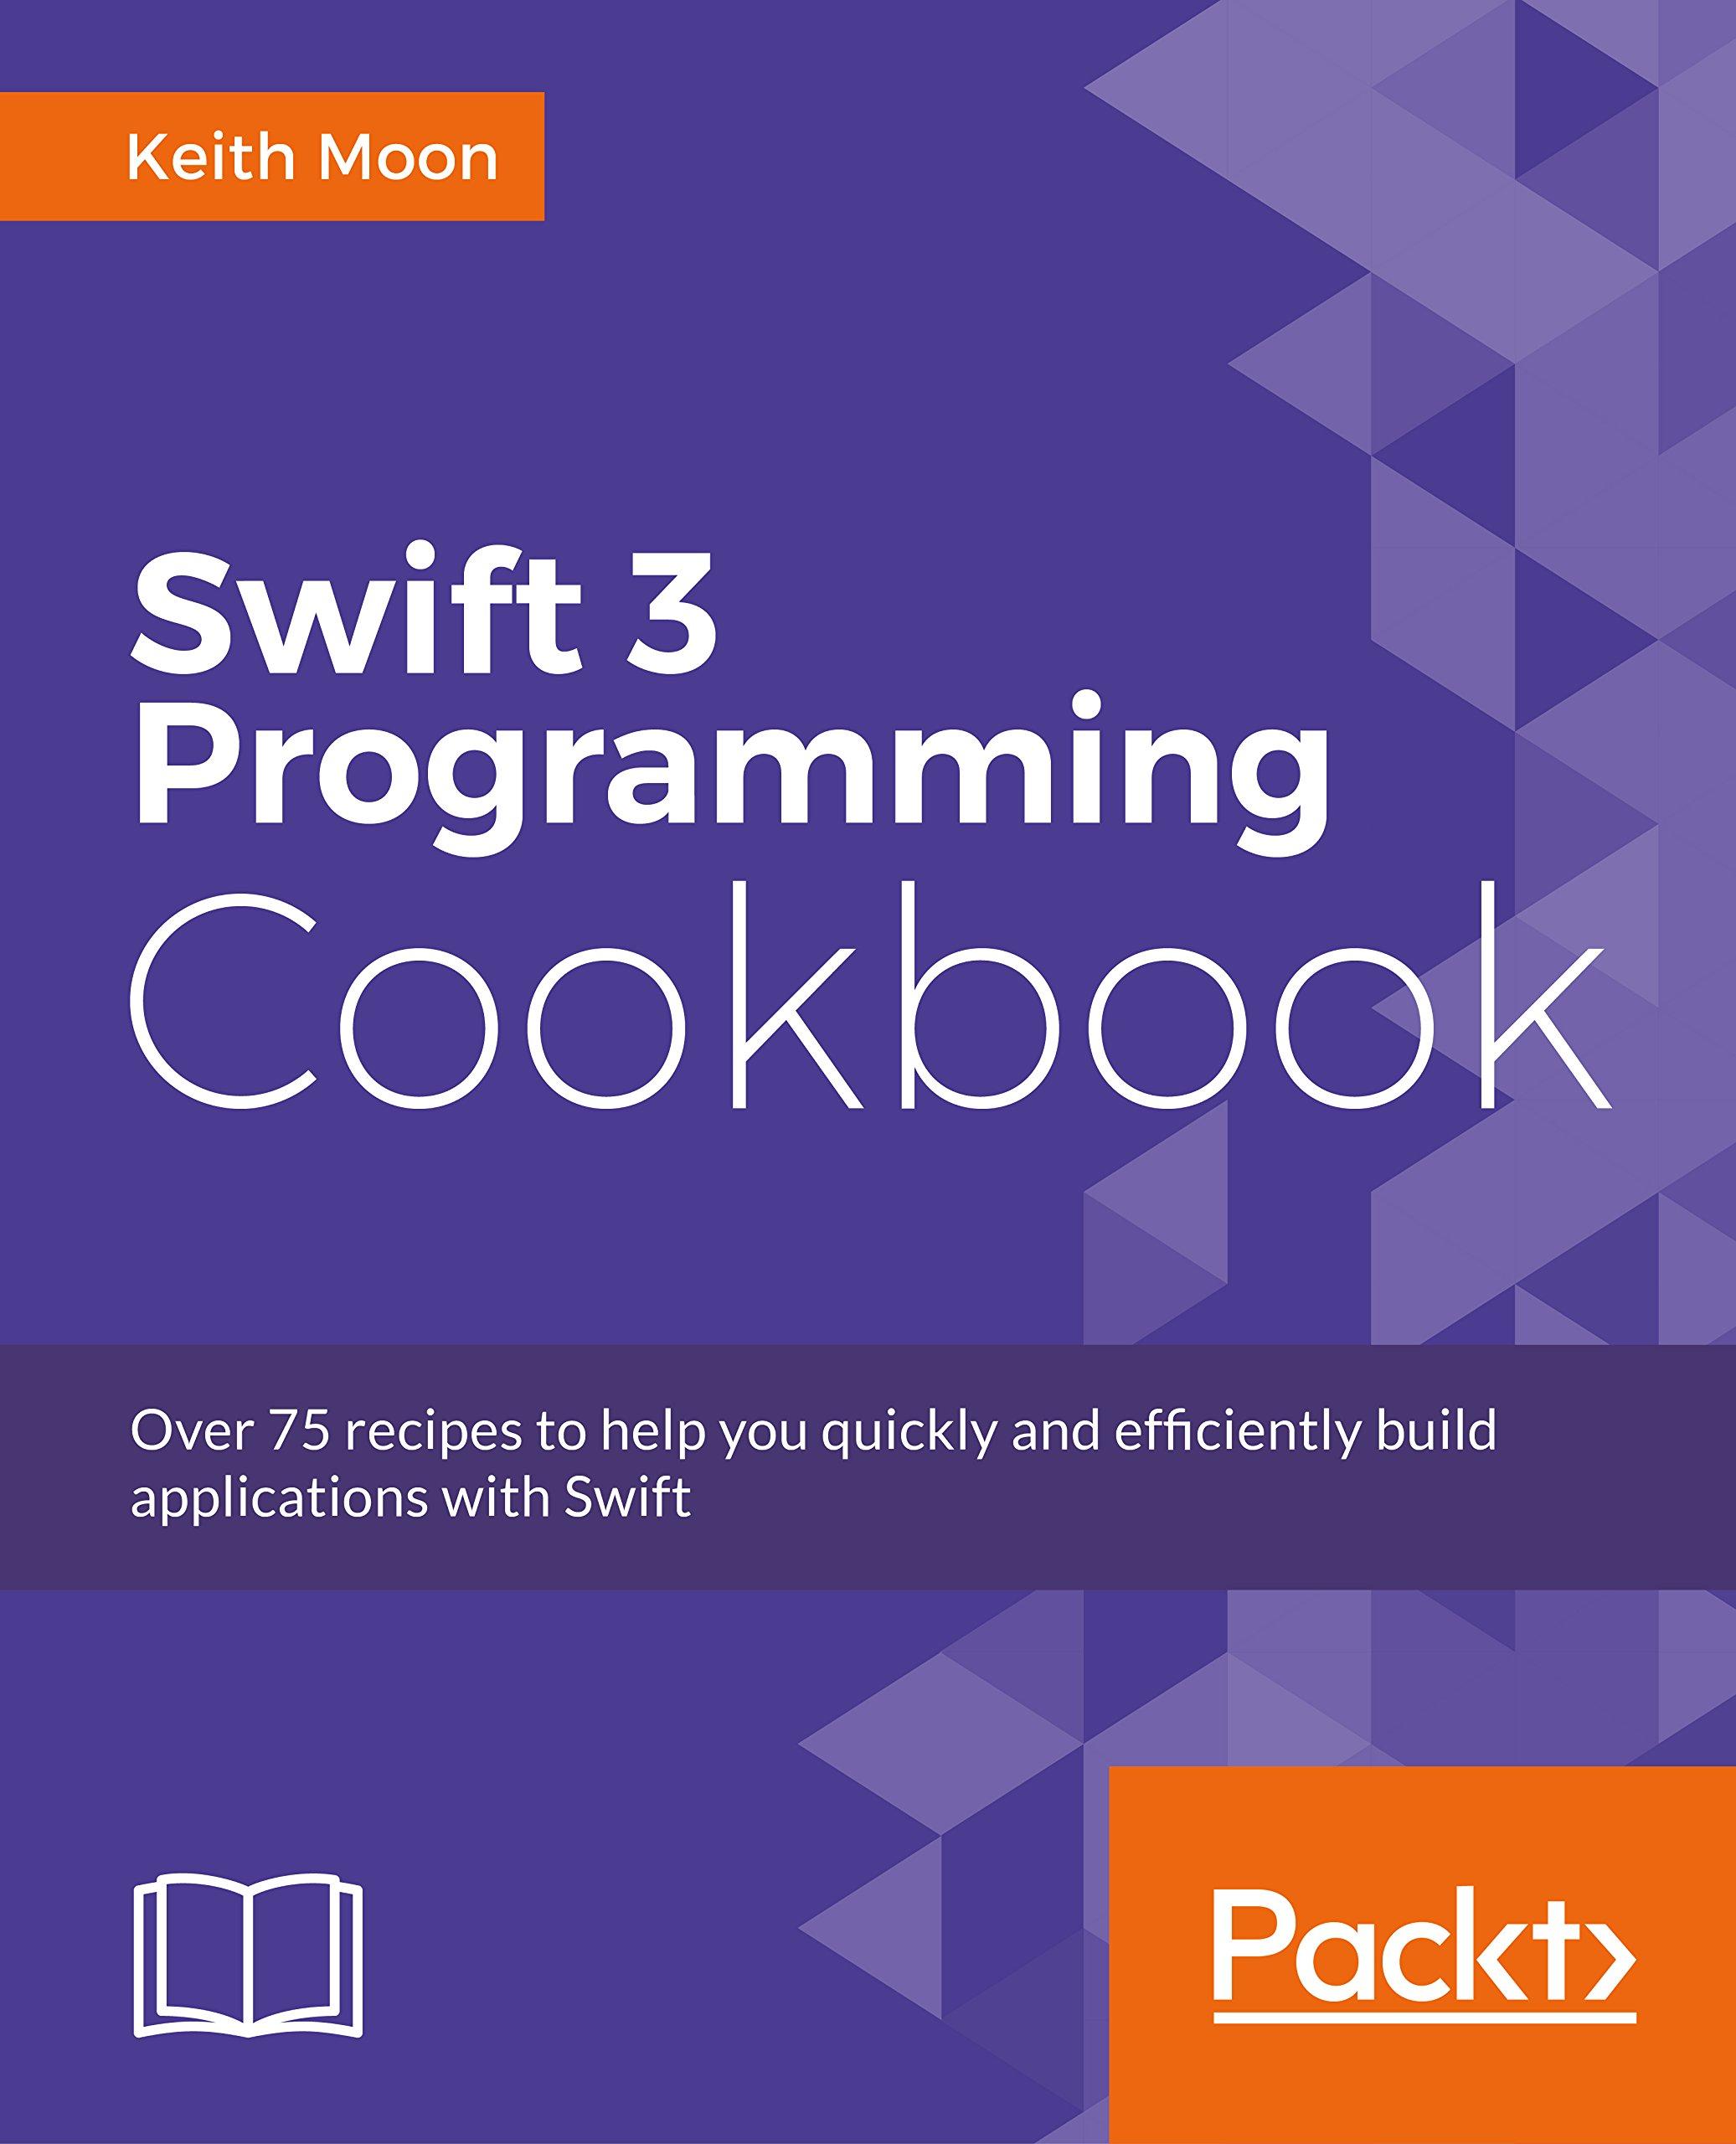 Swift 3 Programming Cookbook: Amazon: Keith Moon: 9781786460899: Books